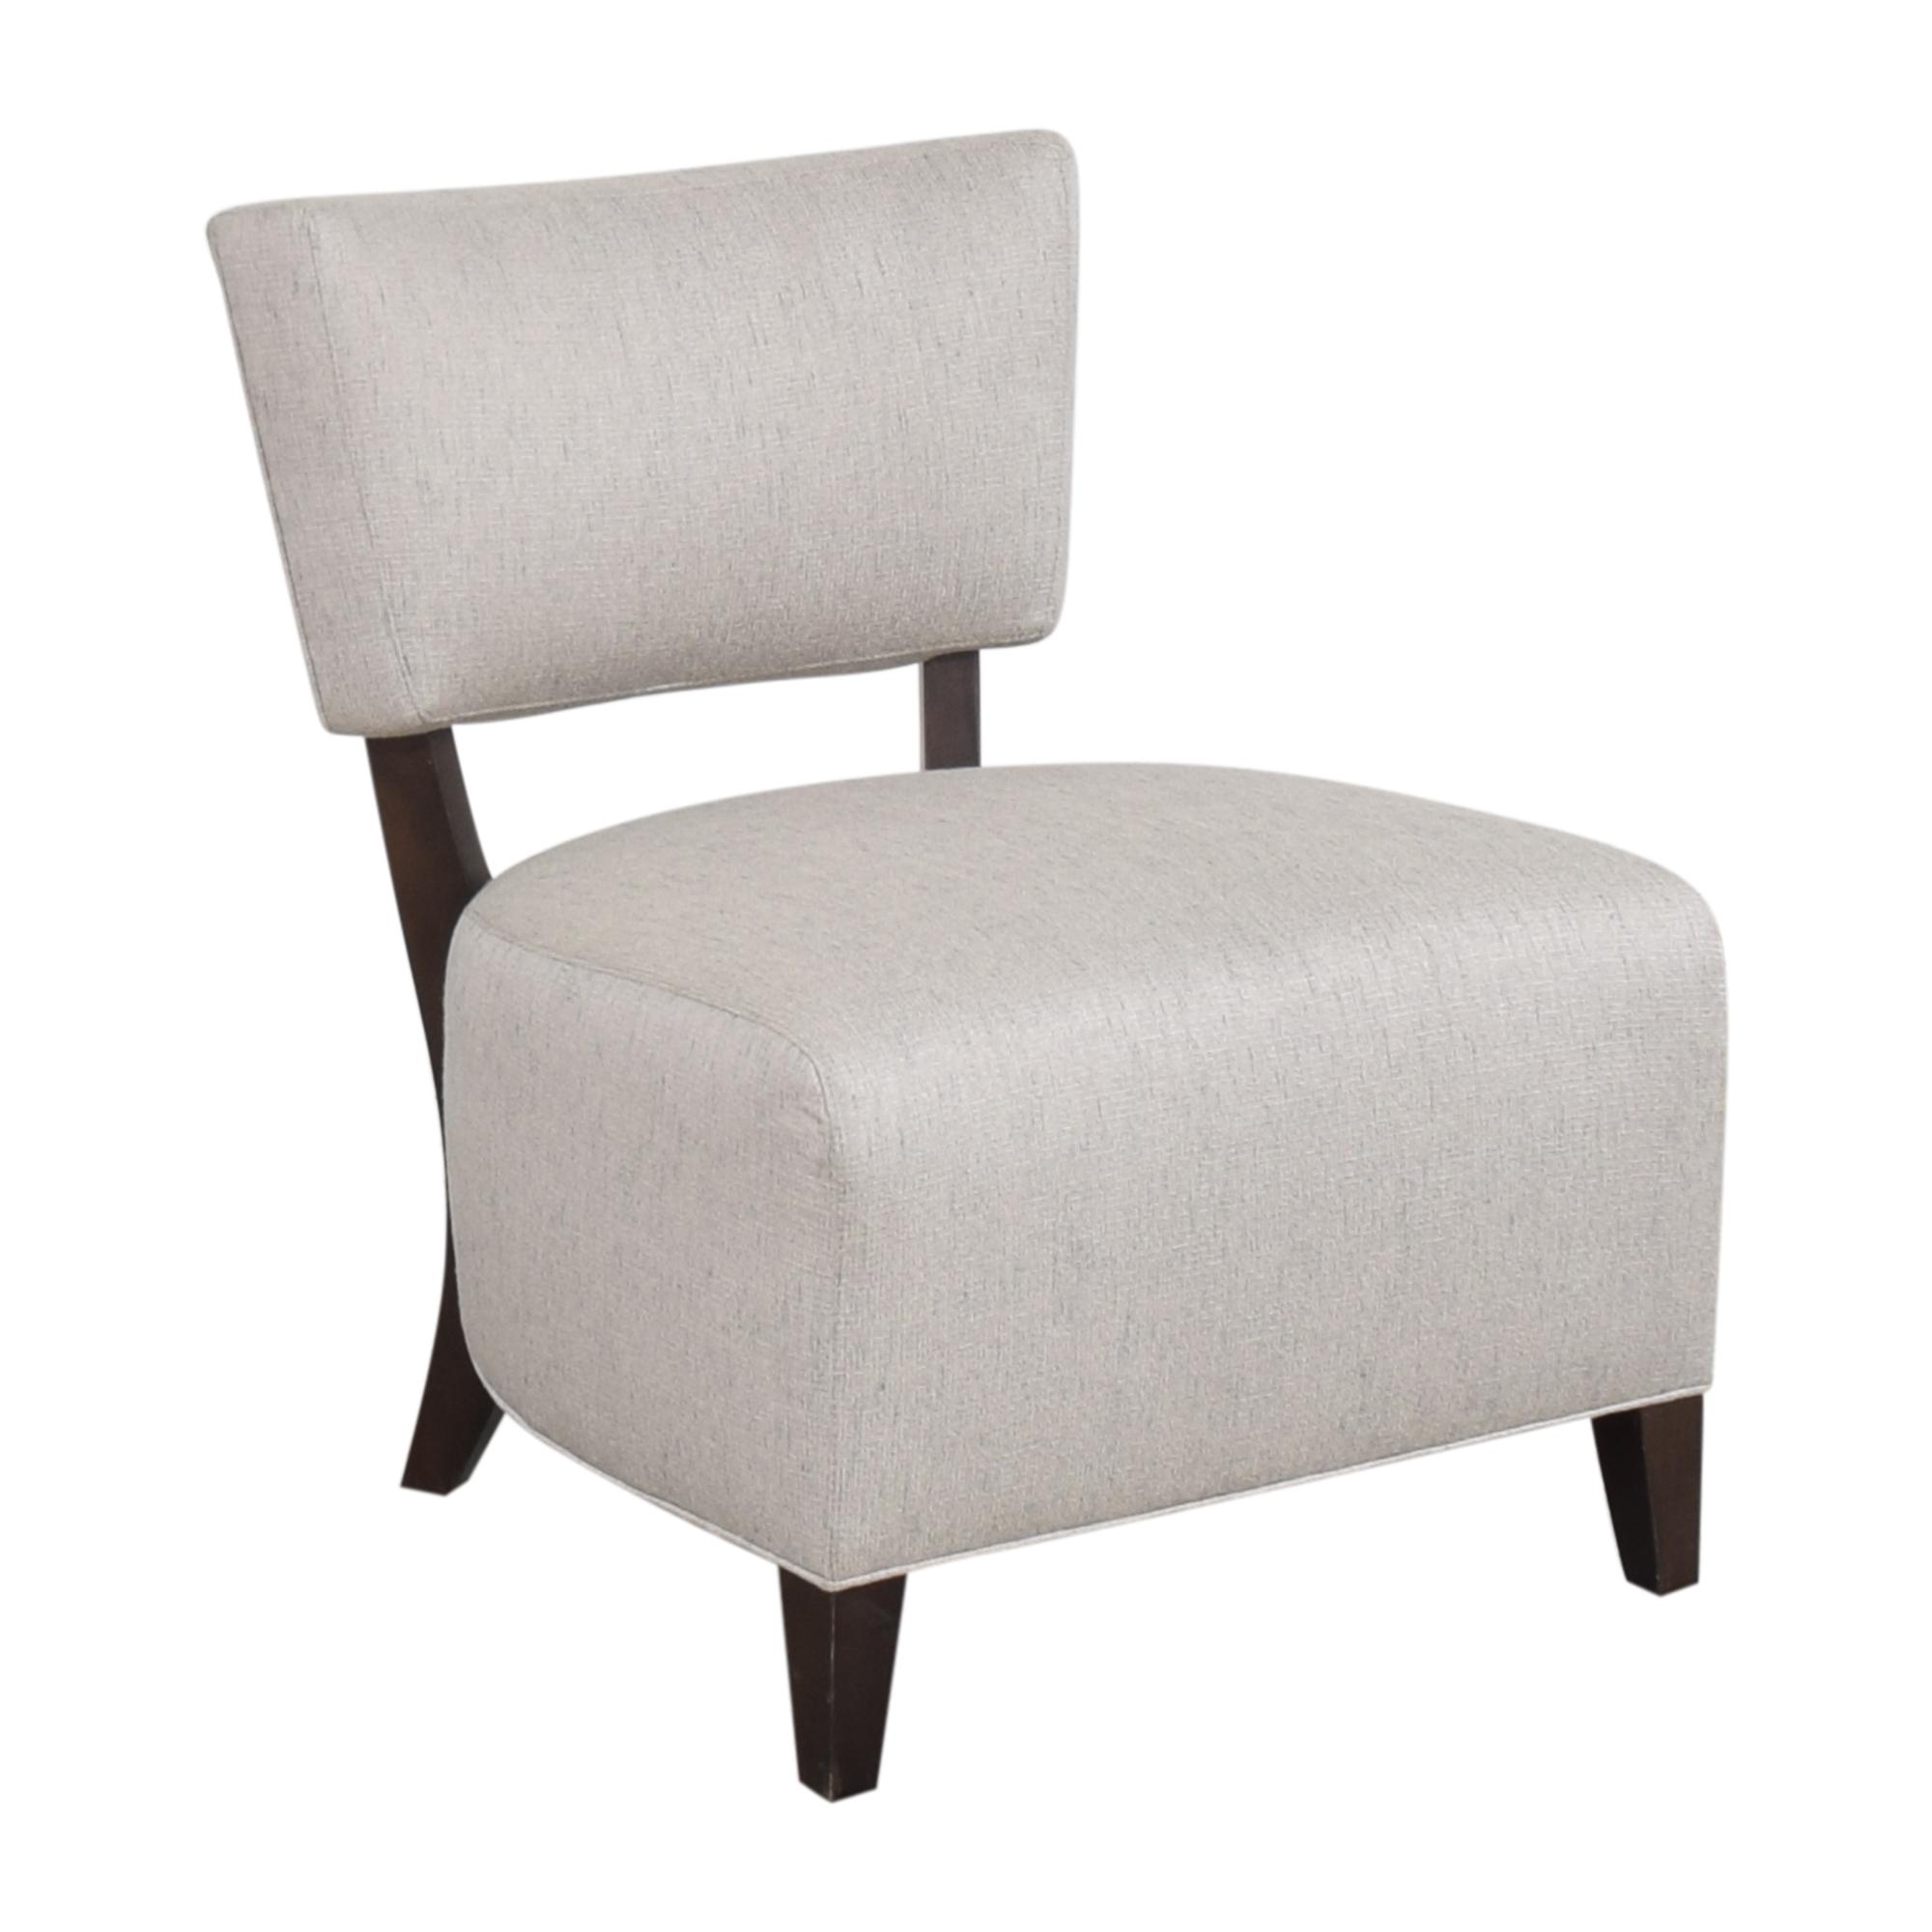 shop Ethan Allen Armless Accent Chair Ethan Allen Accent Chairs